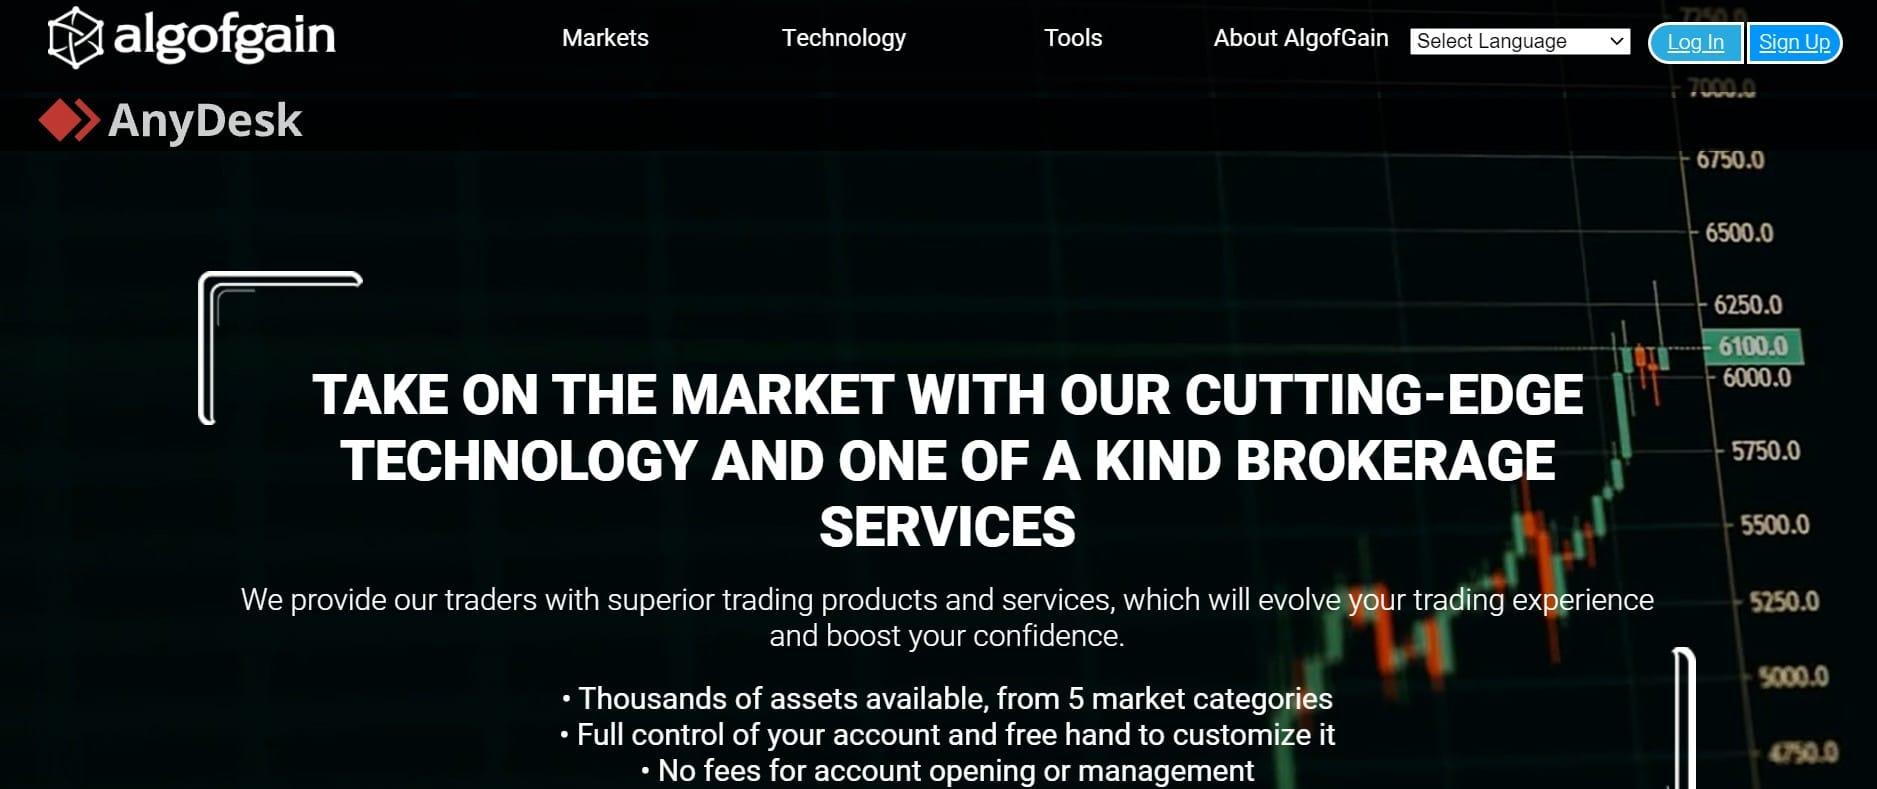 AlgofGain website